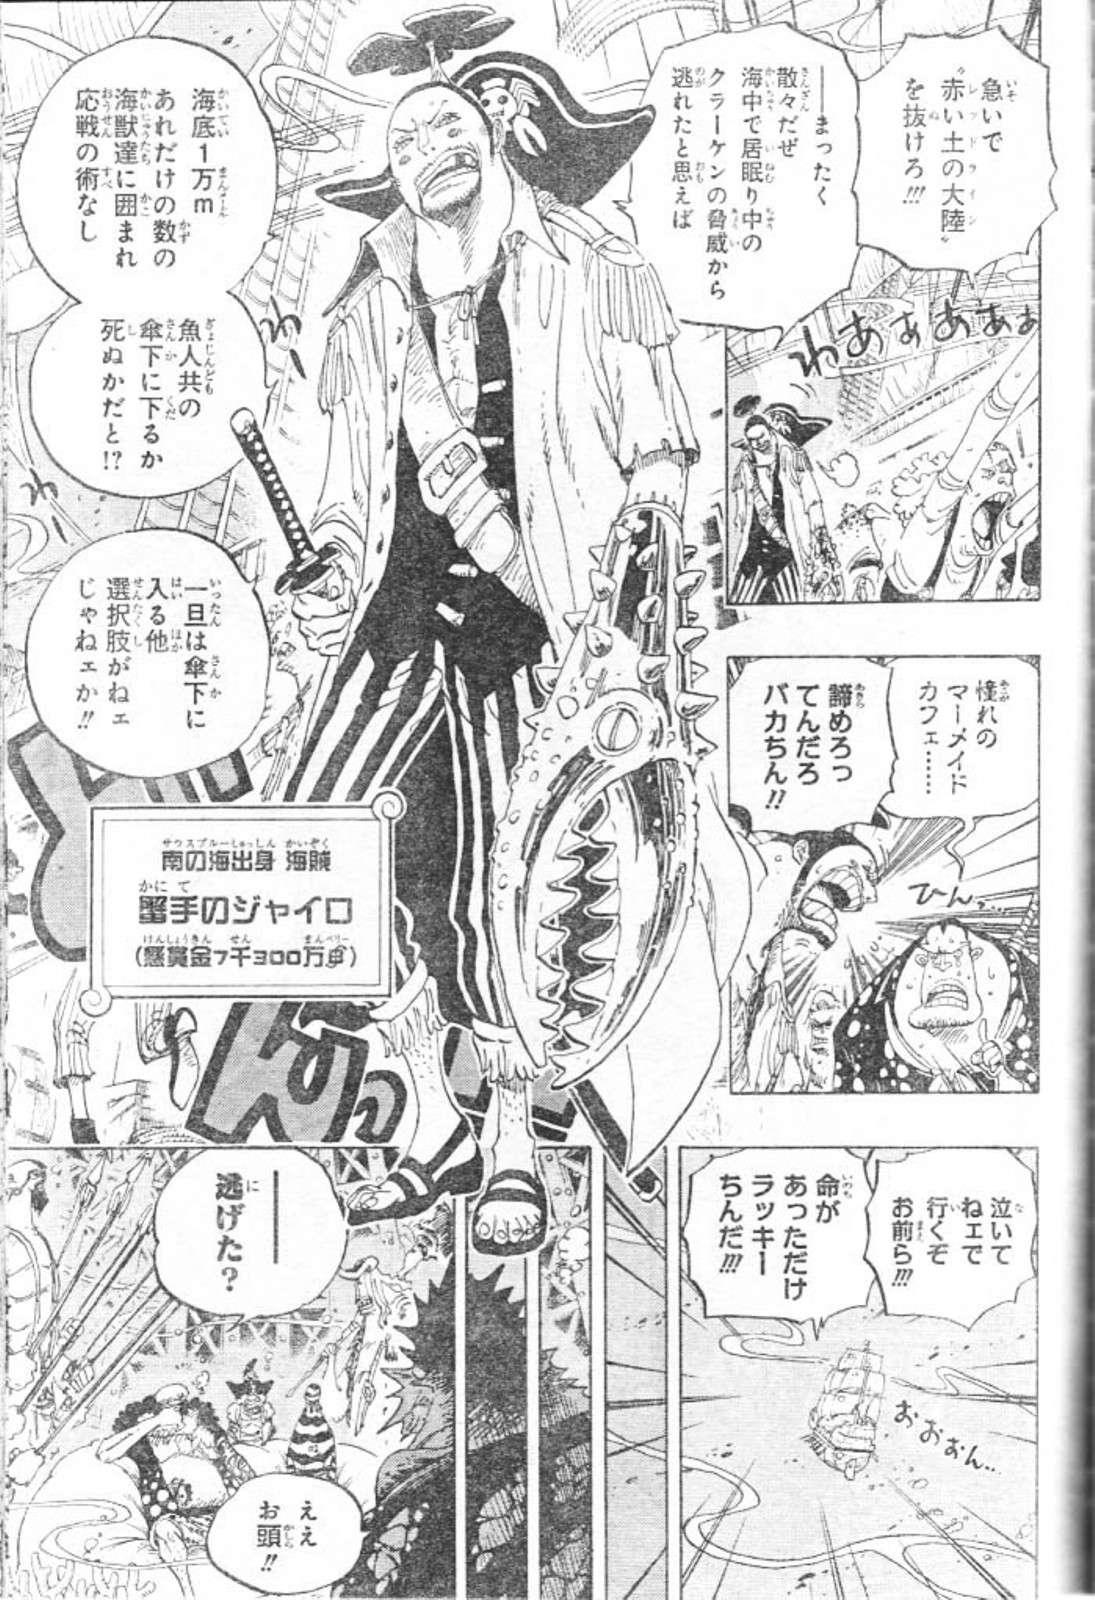 One Piece Manga 611 Spoiler Pics 03_raw10